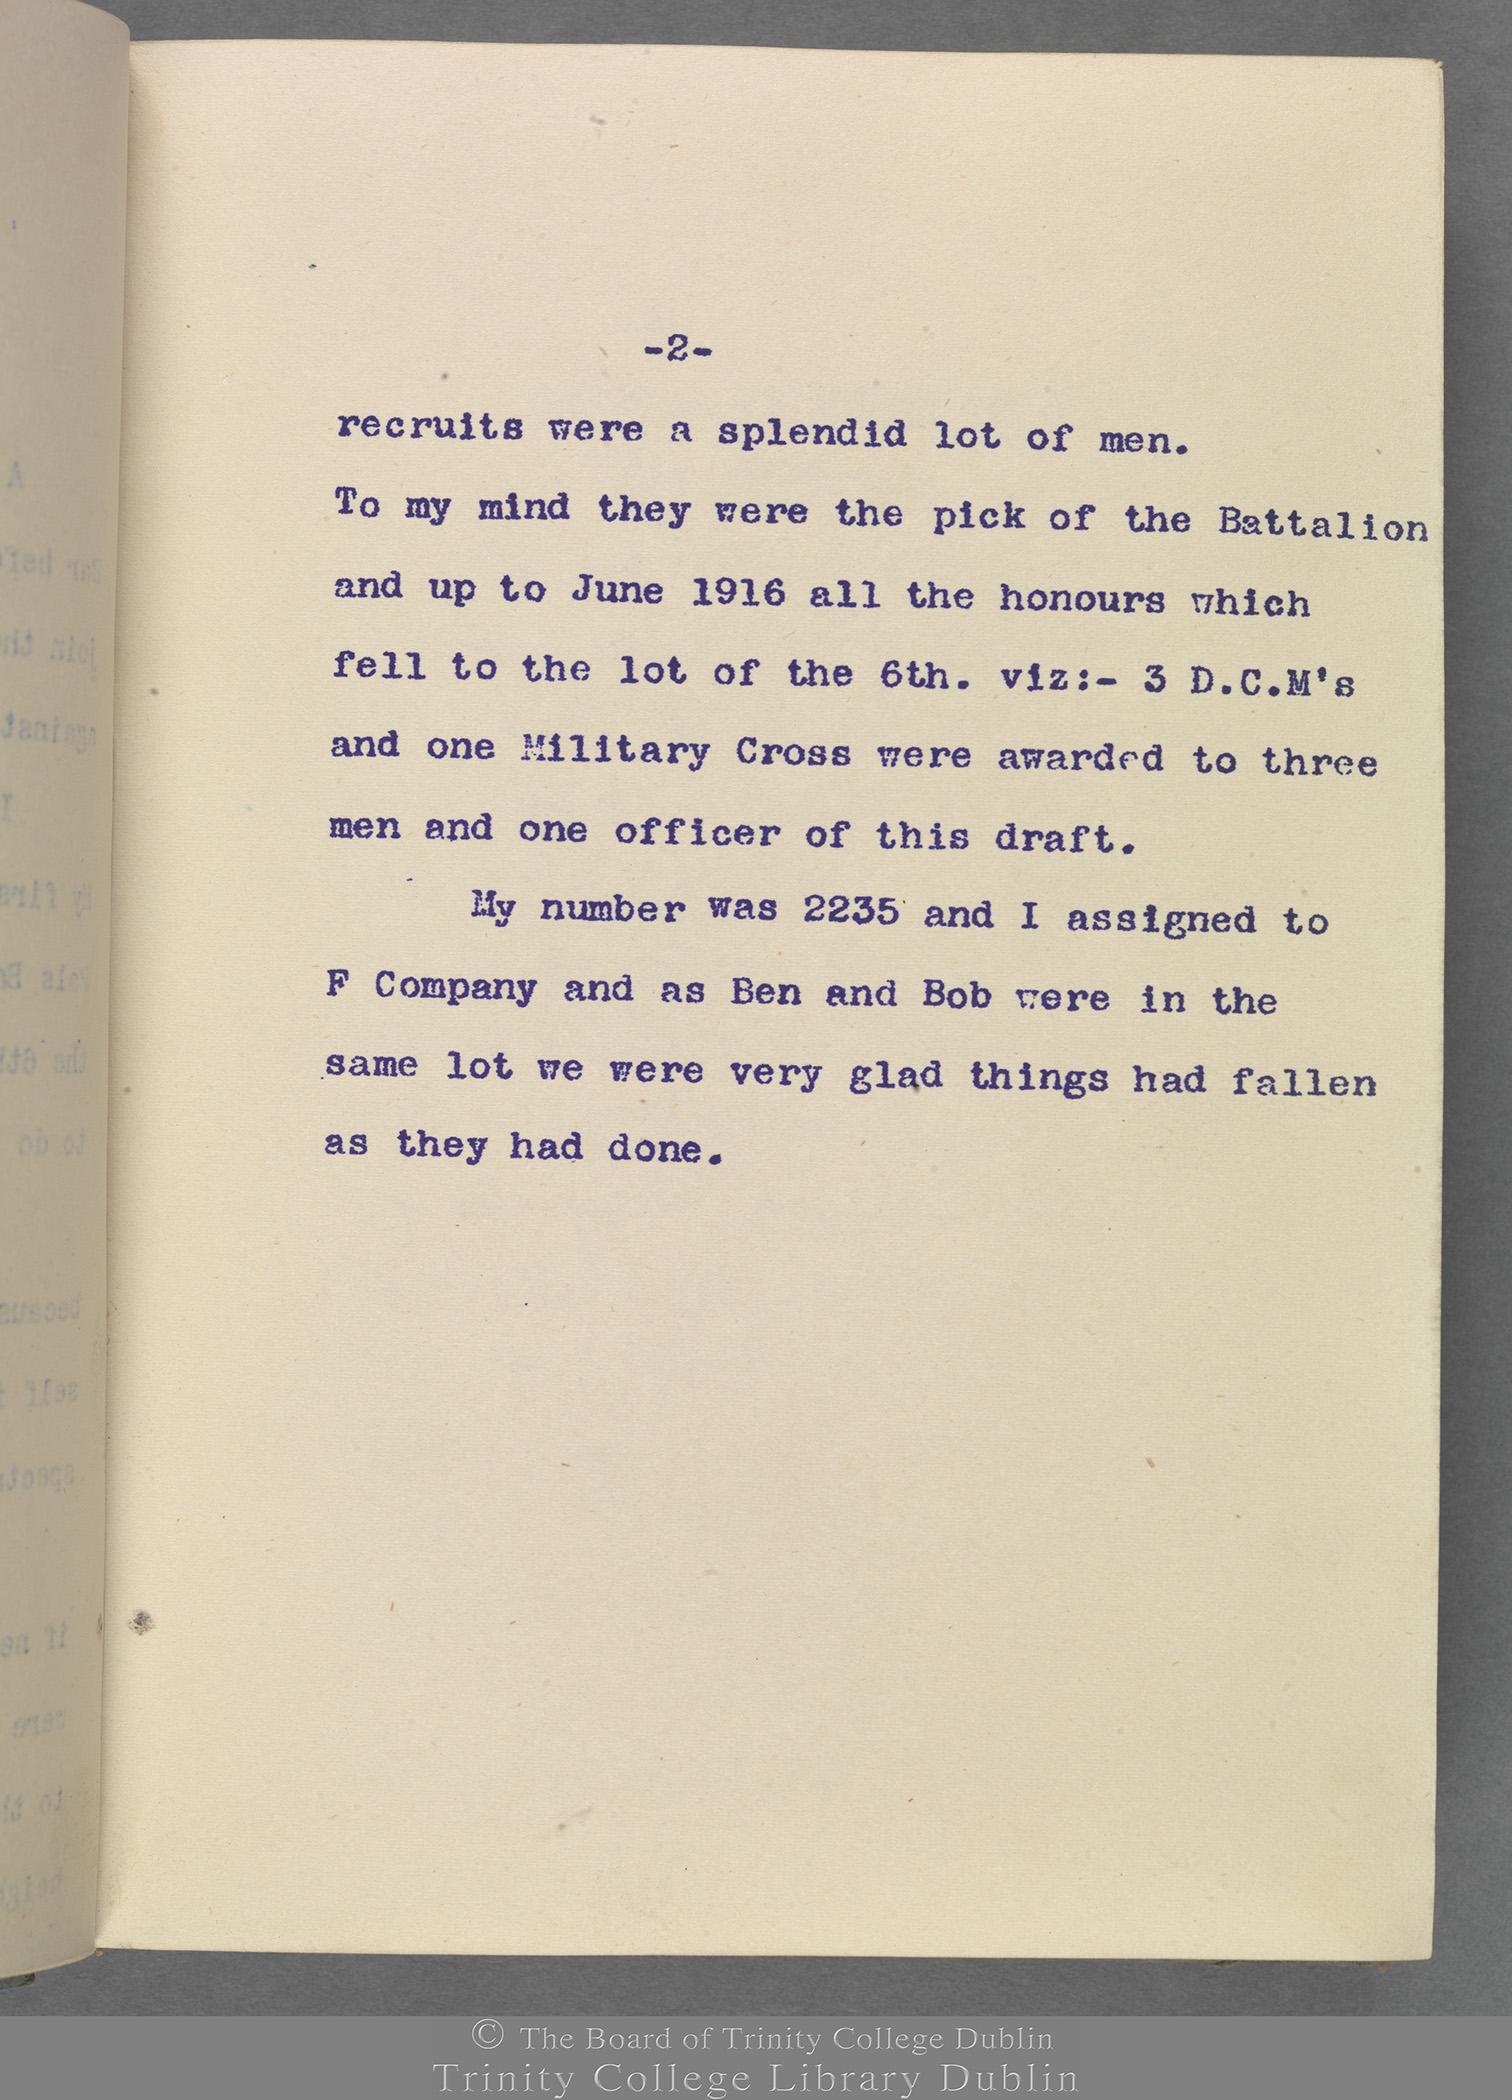 TCD MS 10853 folio 2 recto